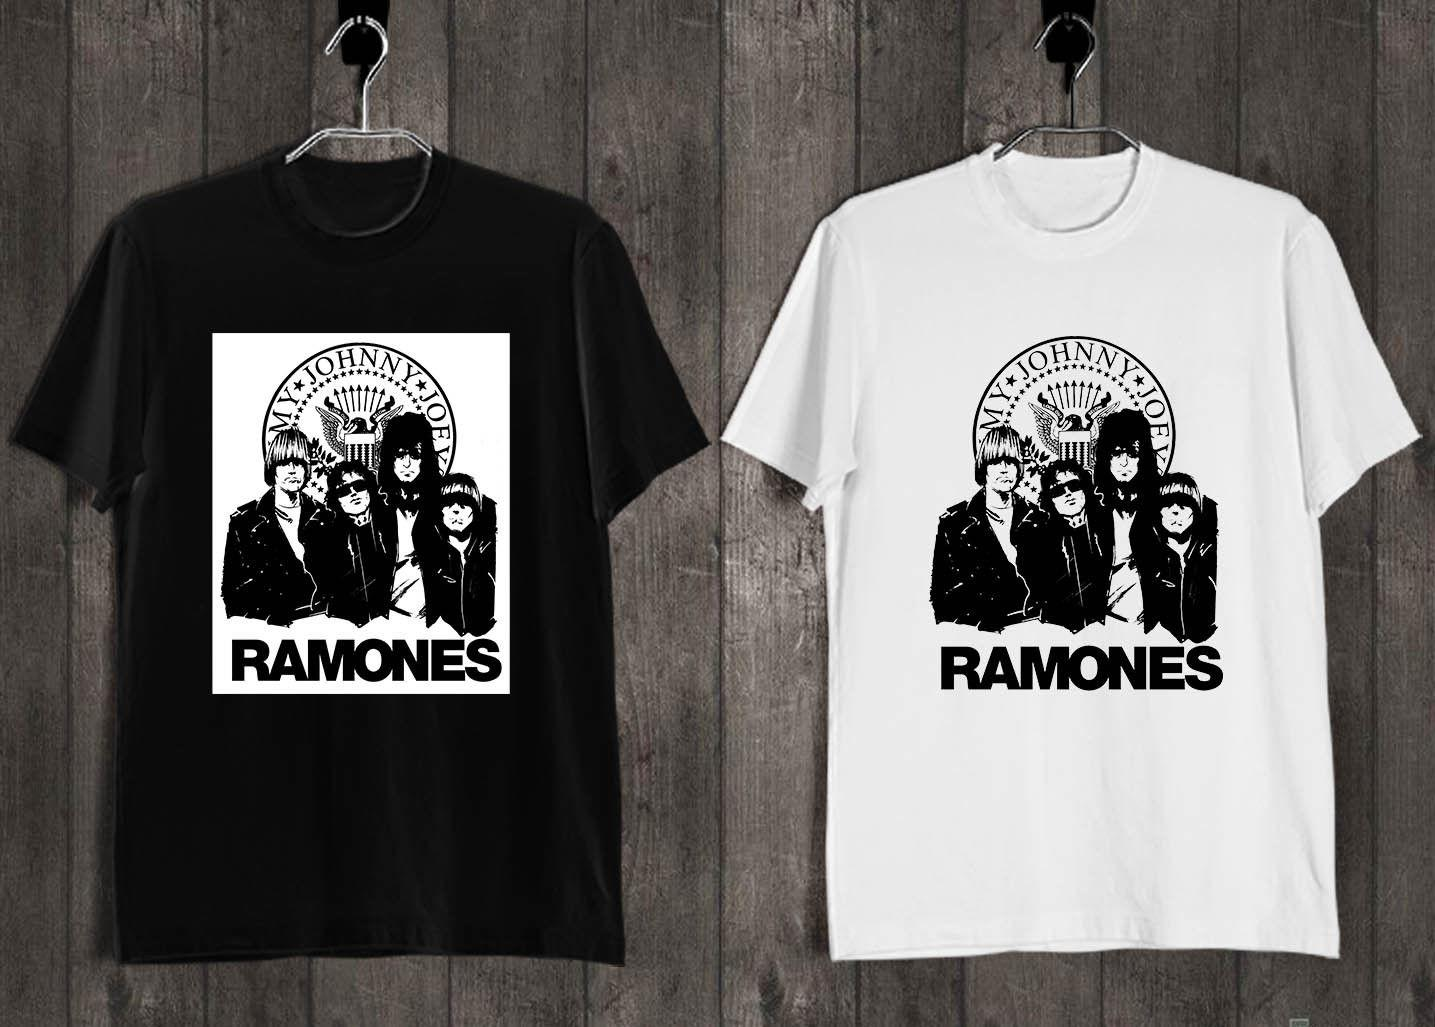 Ramones Punk Rock T Shirt Black White B Quality T Shirts Men